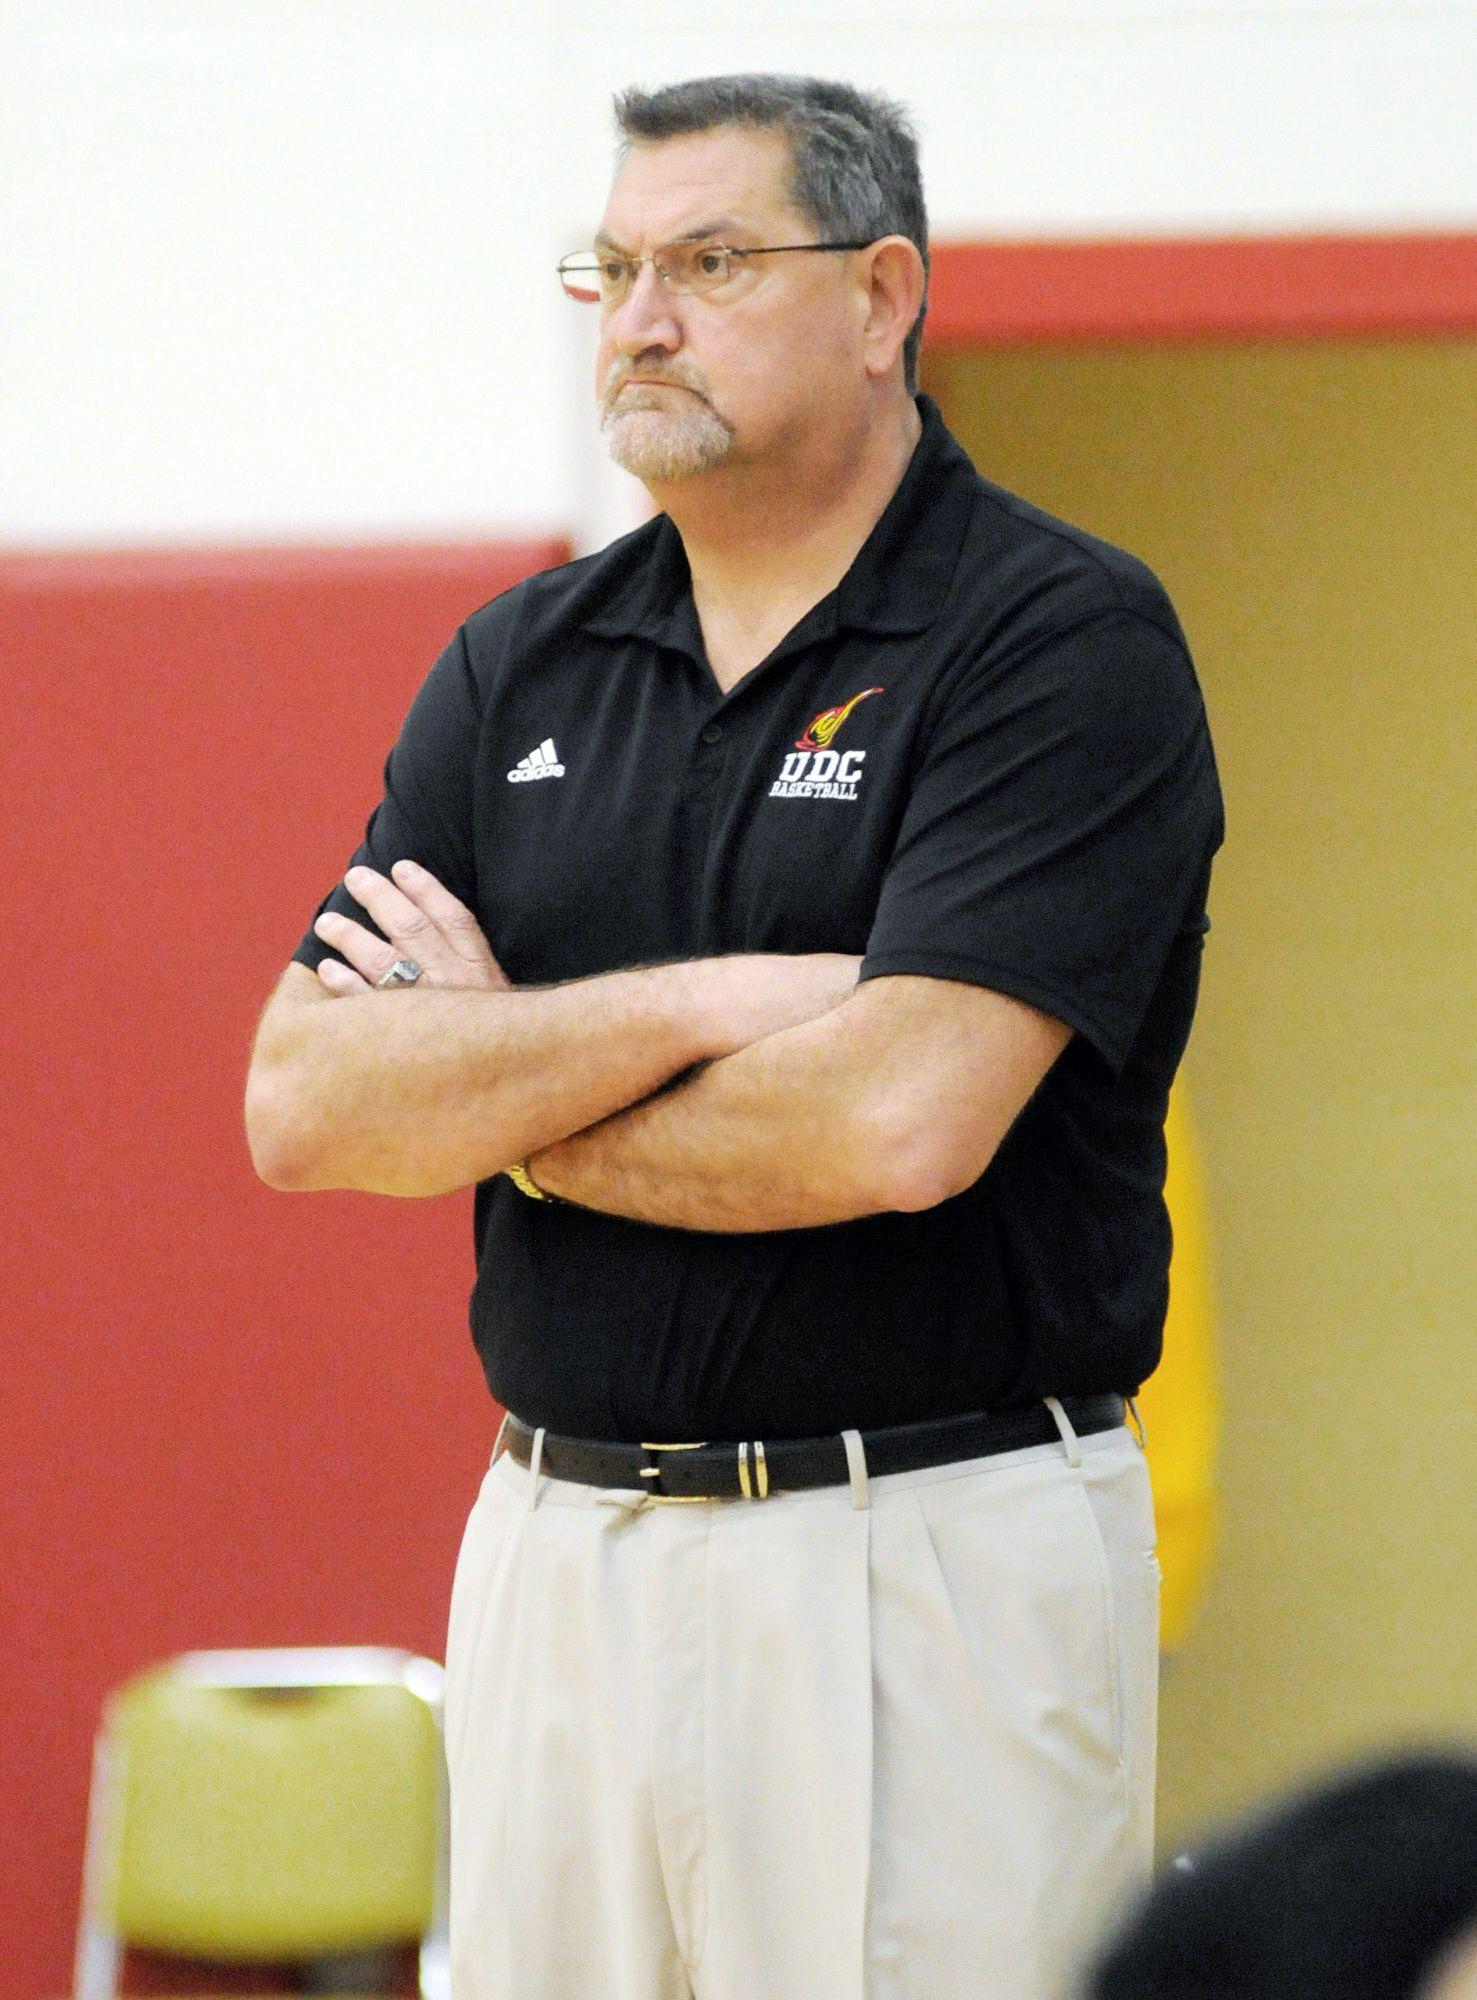 UDC responds to Jeff Ruland s tough love coaching method